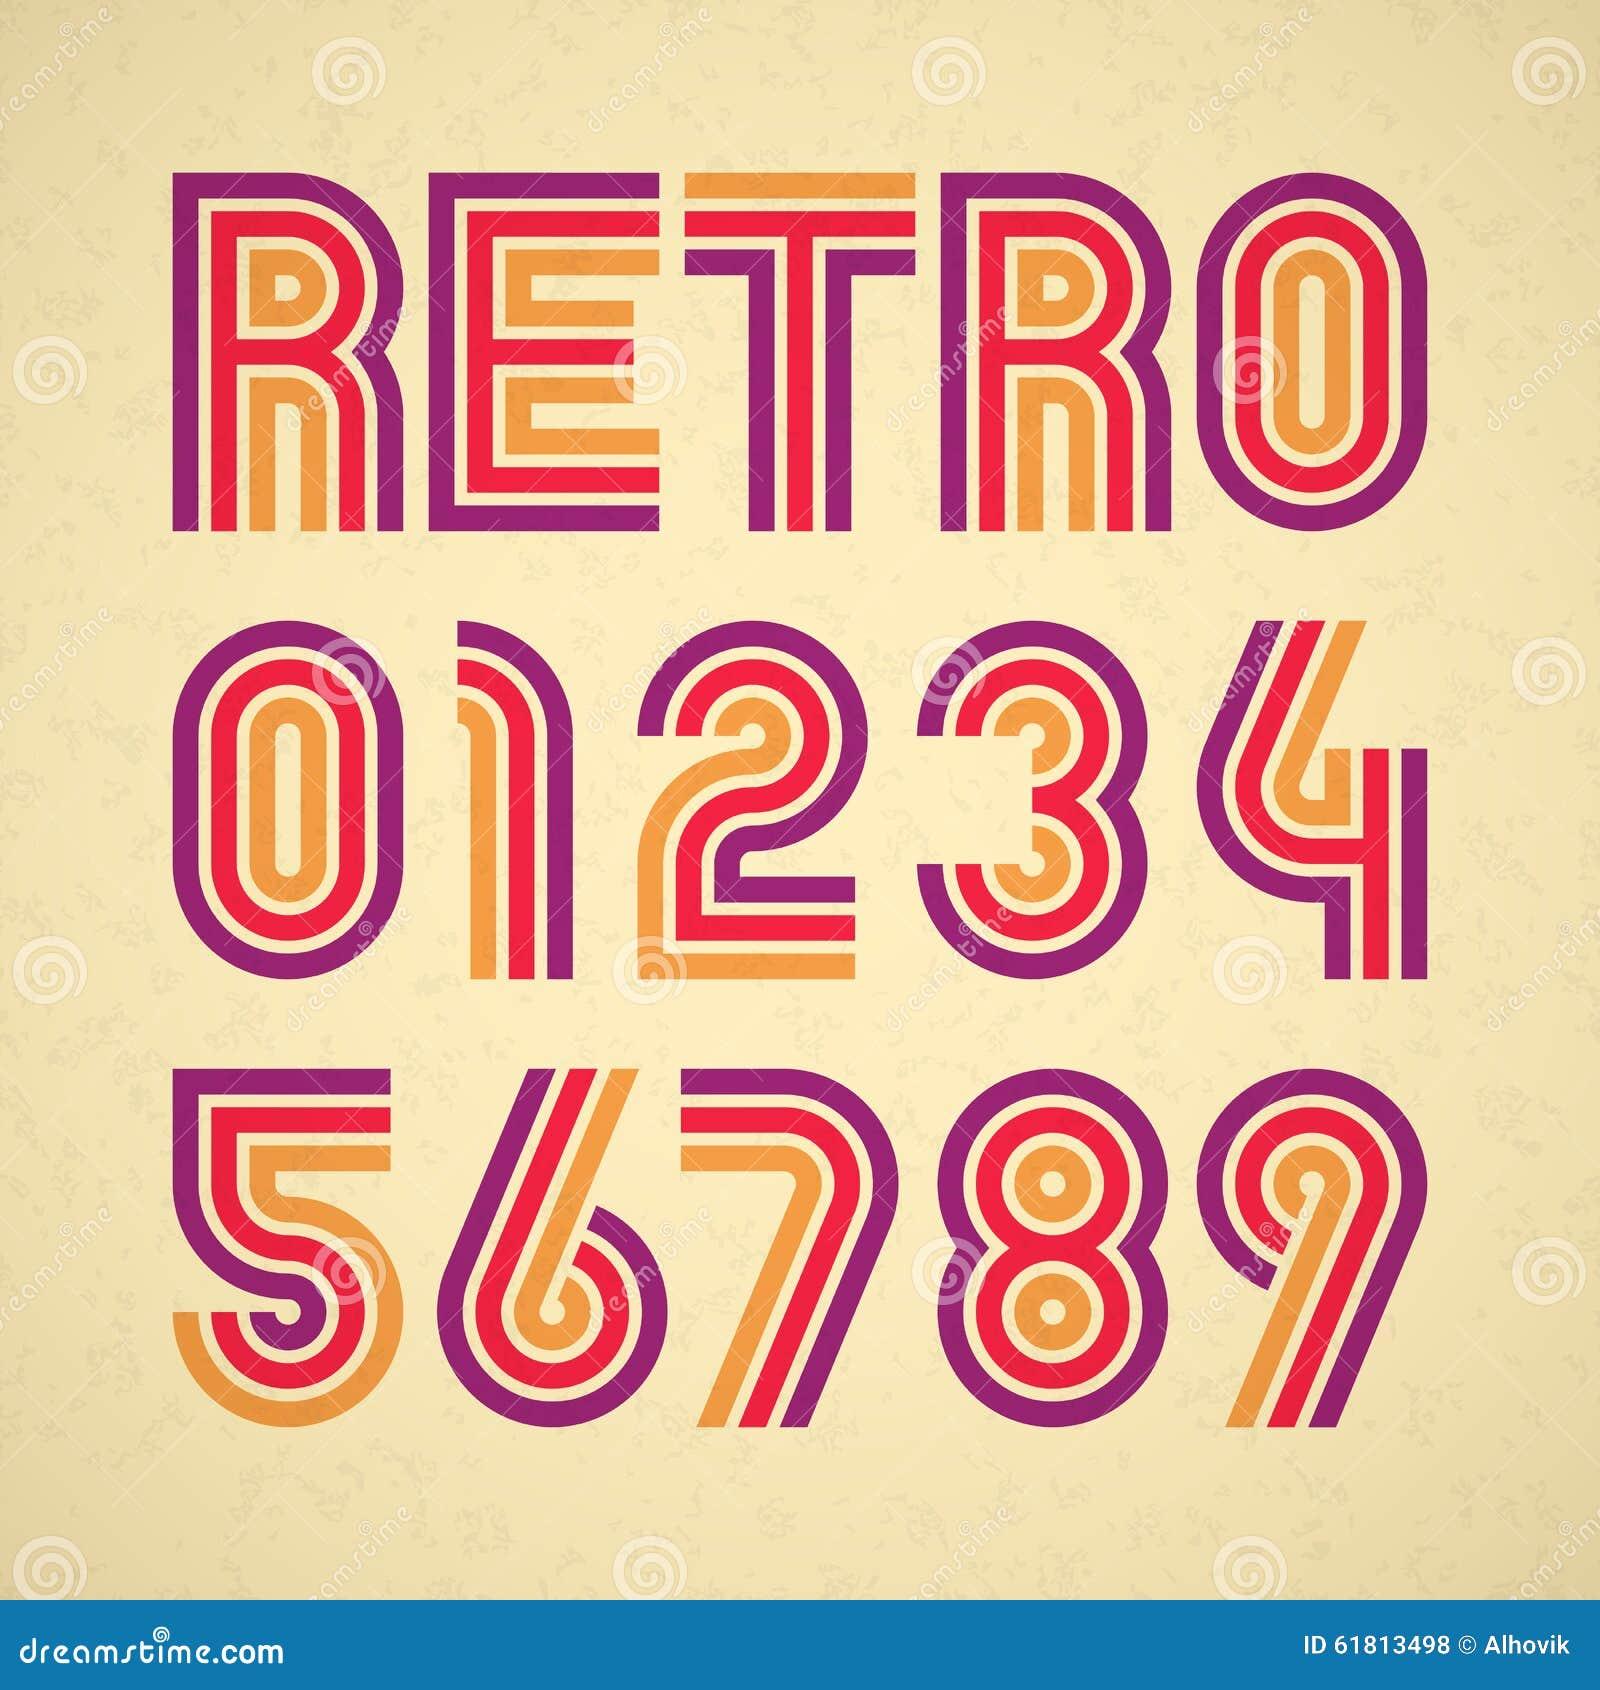 Retro Style Alphabet Numbers Stock Vector - Image: 61813498